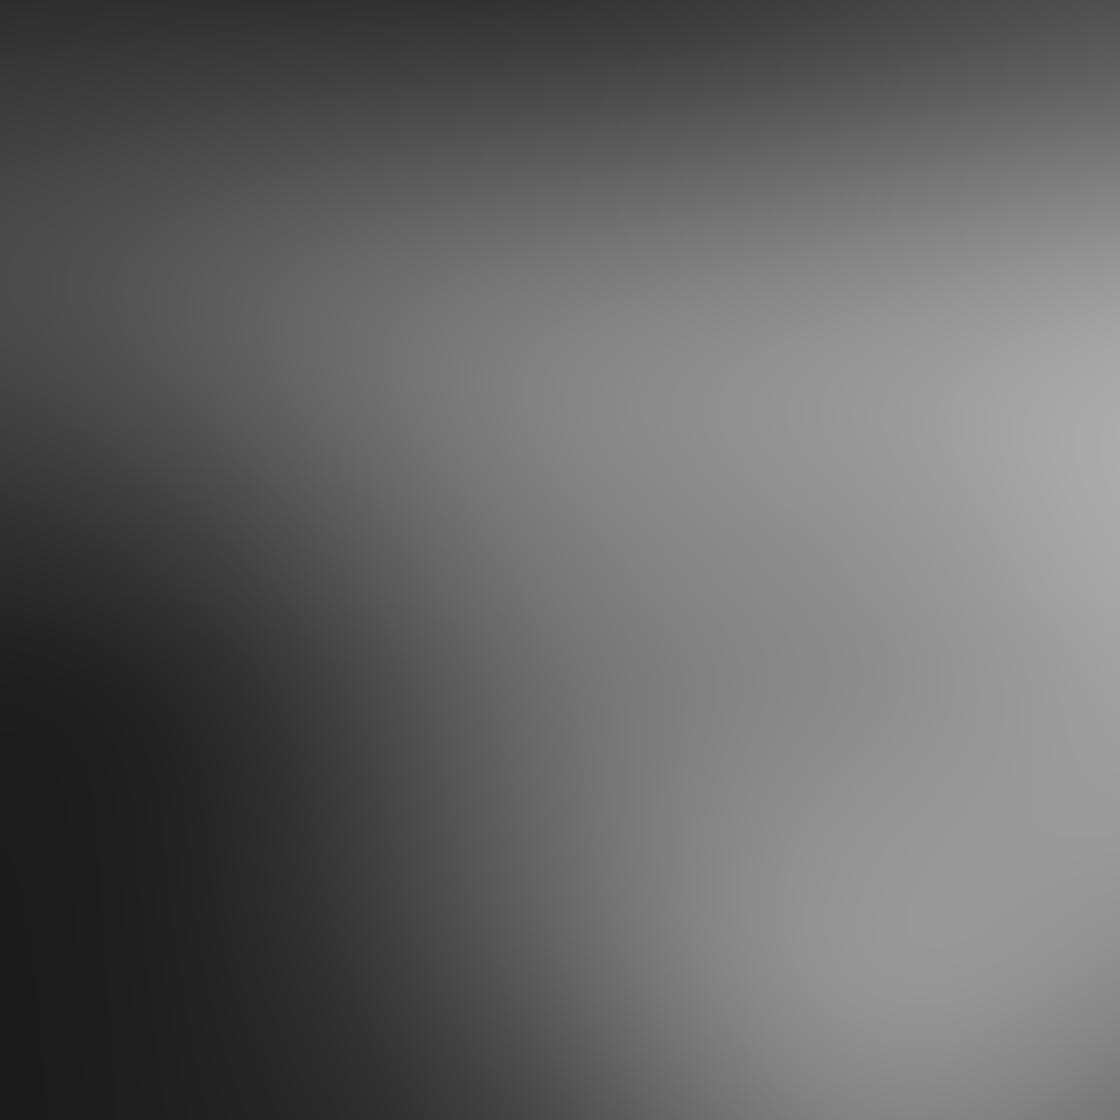 Black & White iPhone Portrait Photos 5